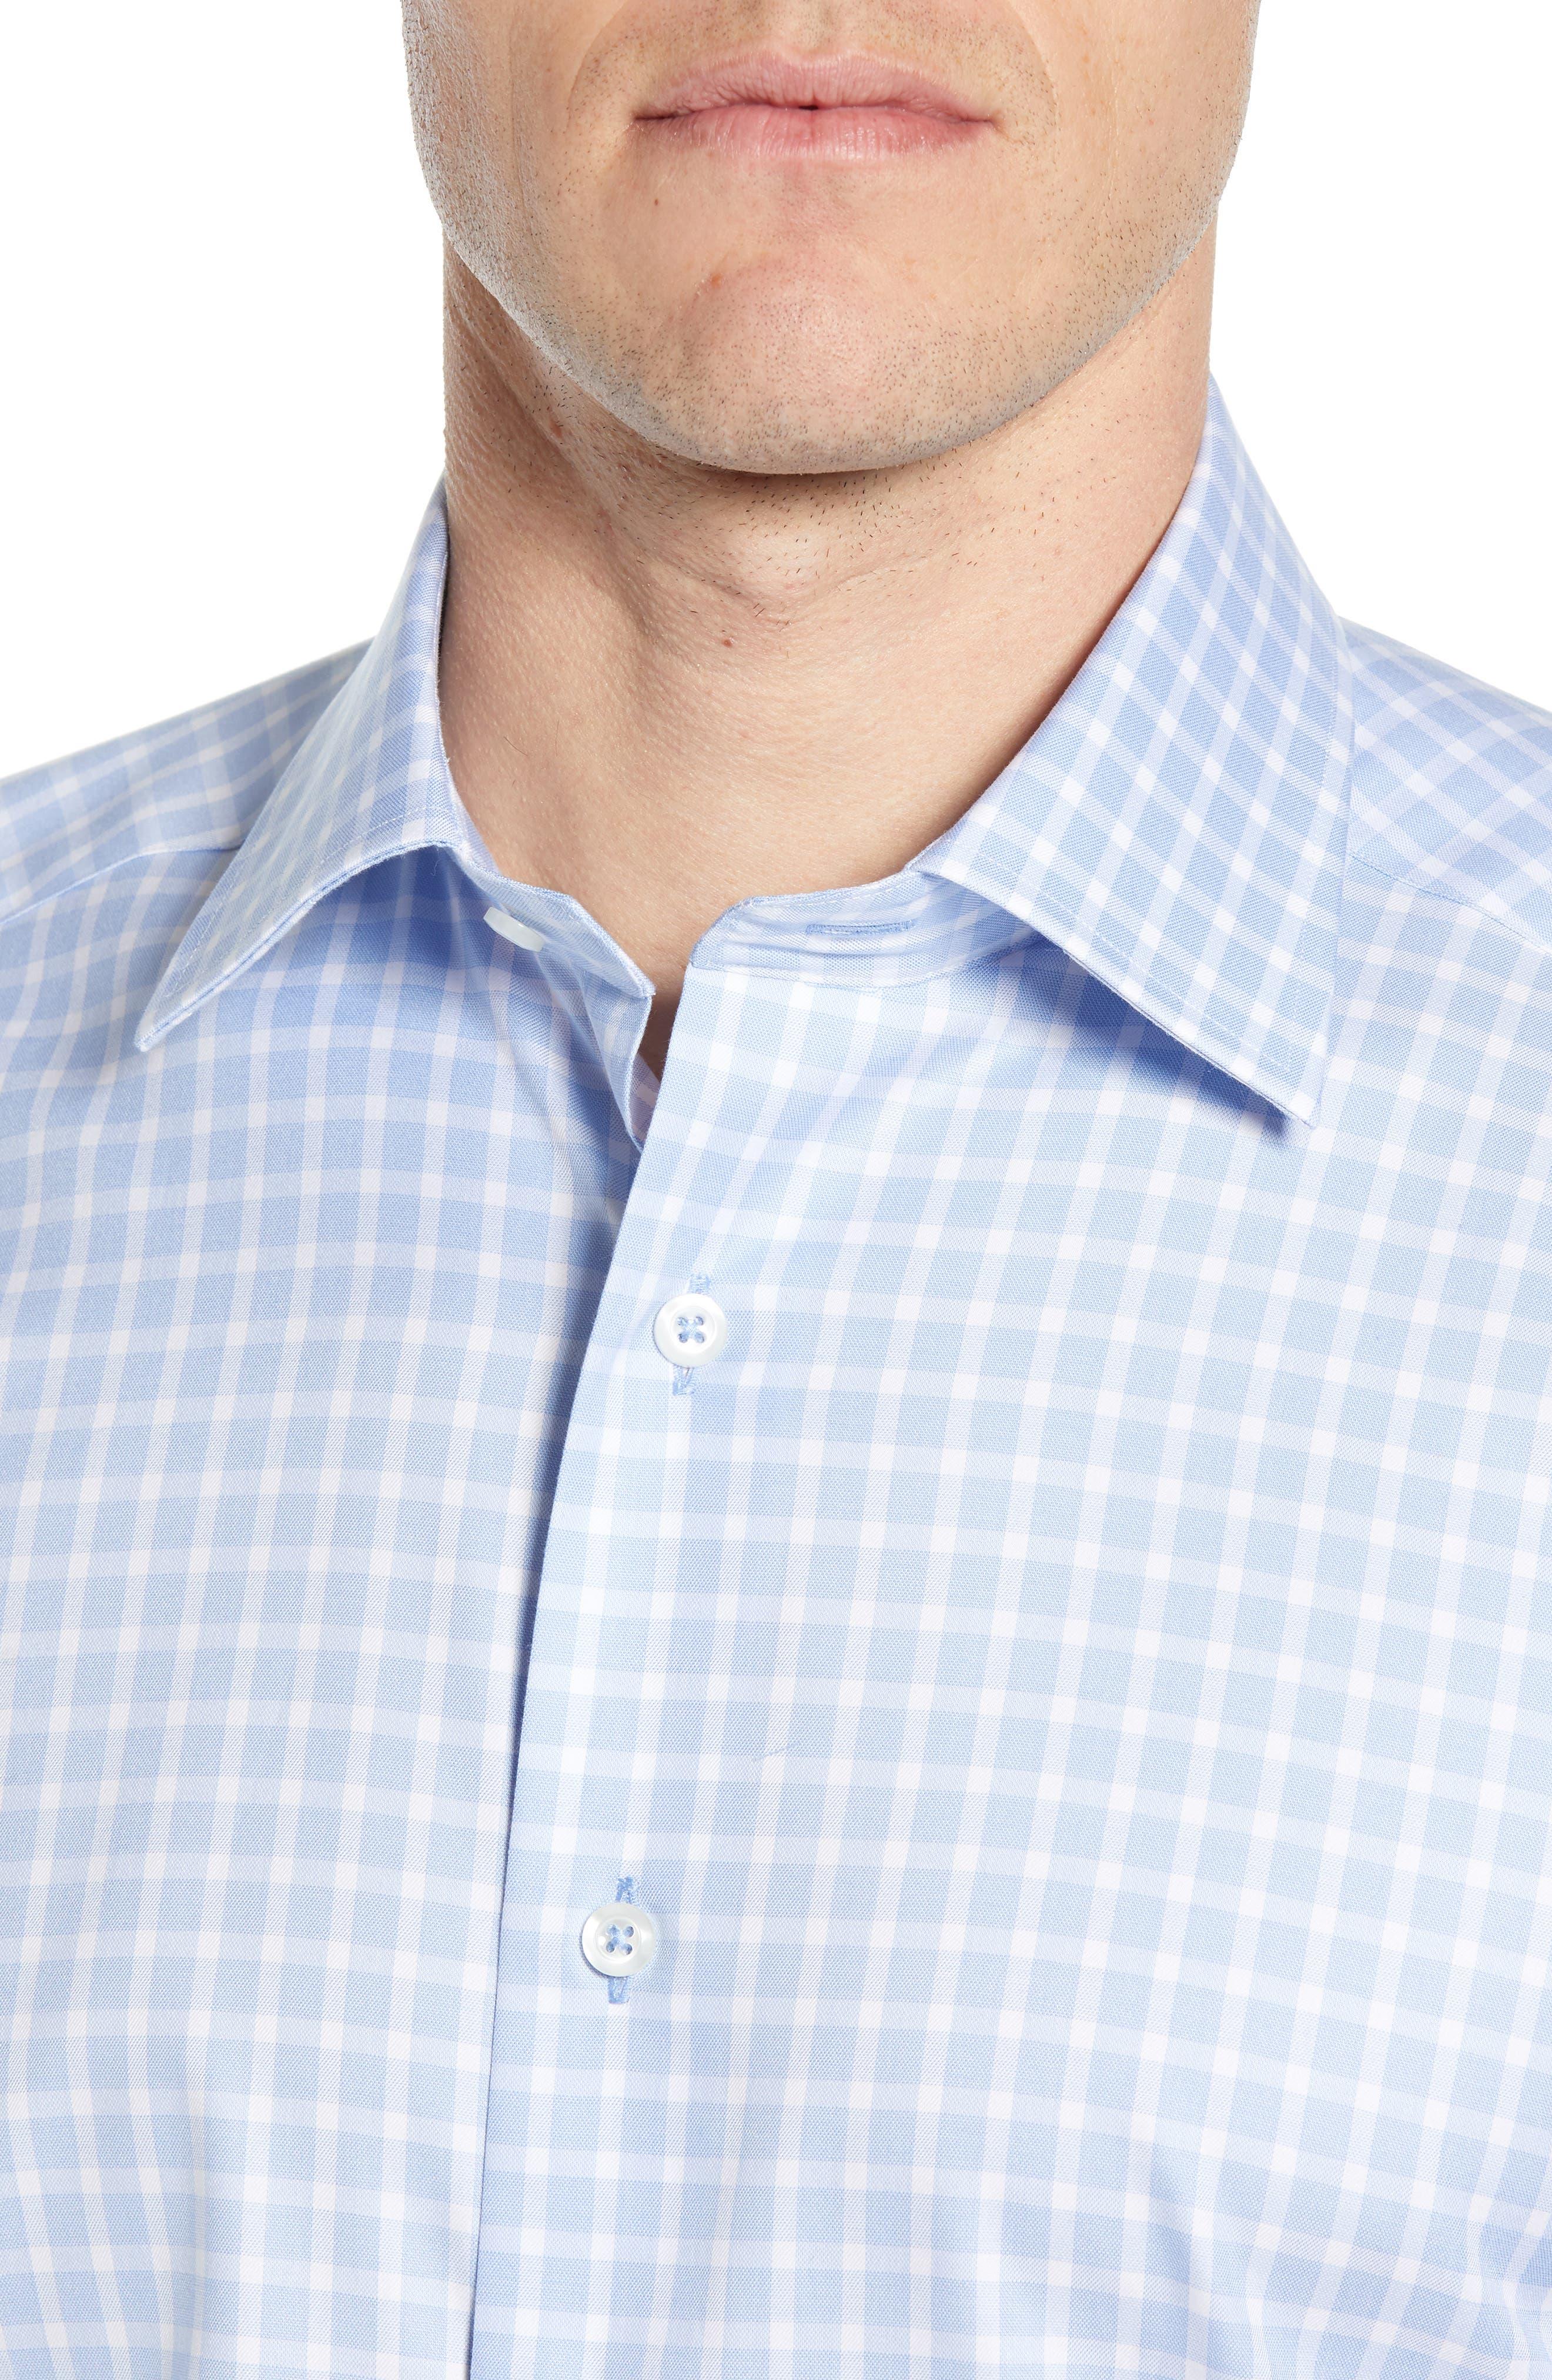 DAVID DONAHUE, Trim Fit Check Dress Shirt, Alternate thumbnail 2, color, BLUE